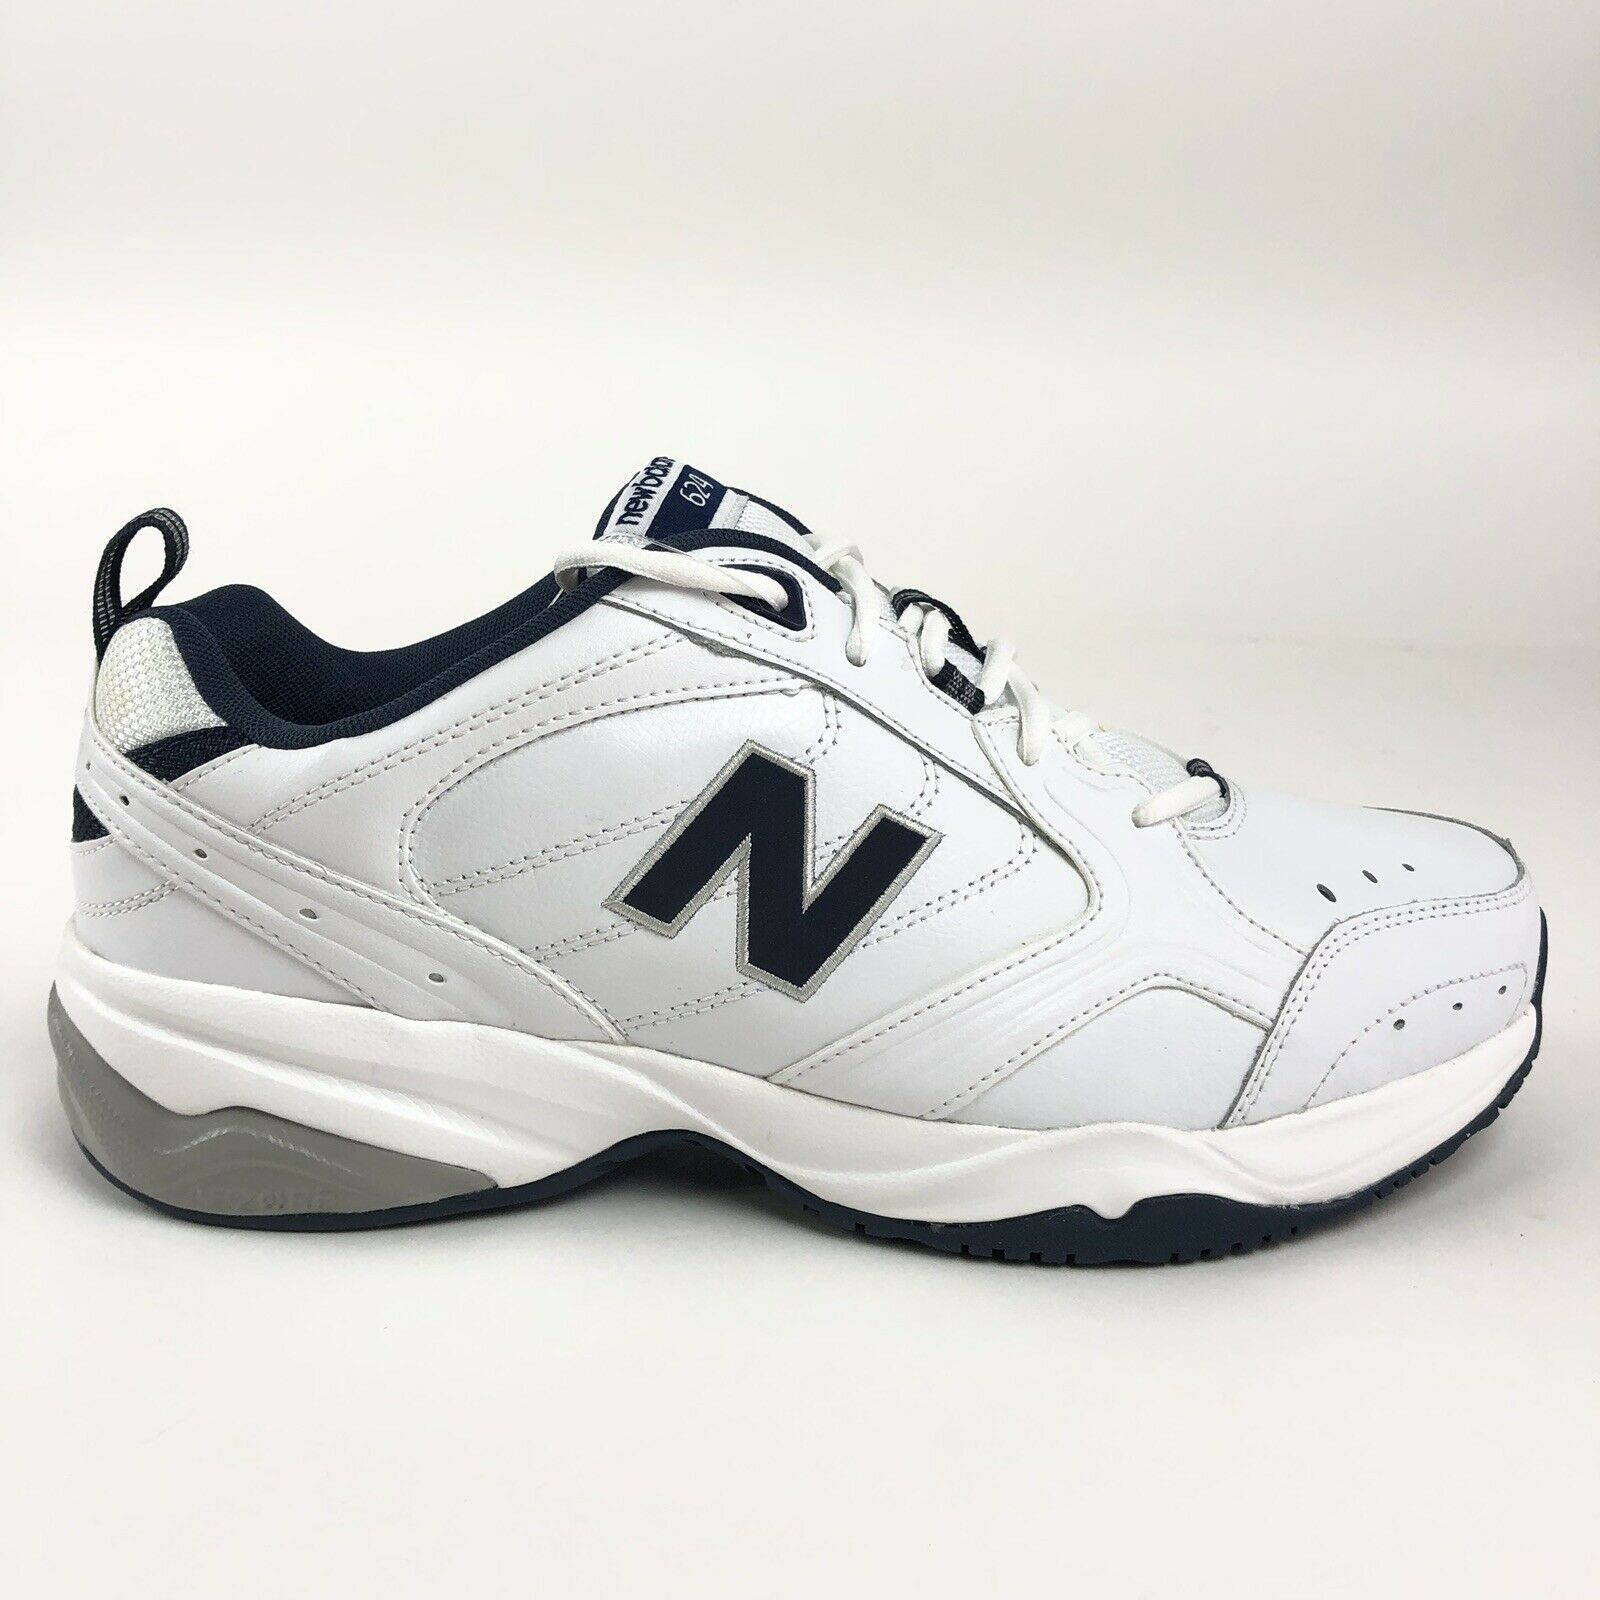 New Balance Mens 624 blanco Training zapatos Talla 8.5 2E Wide MX624WN2